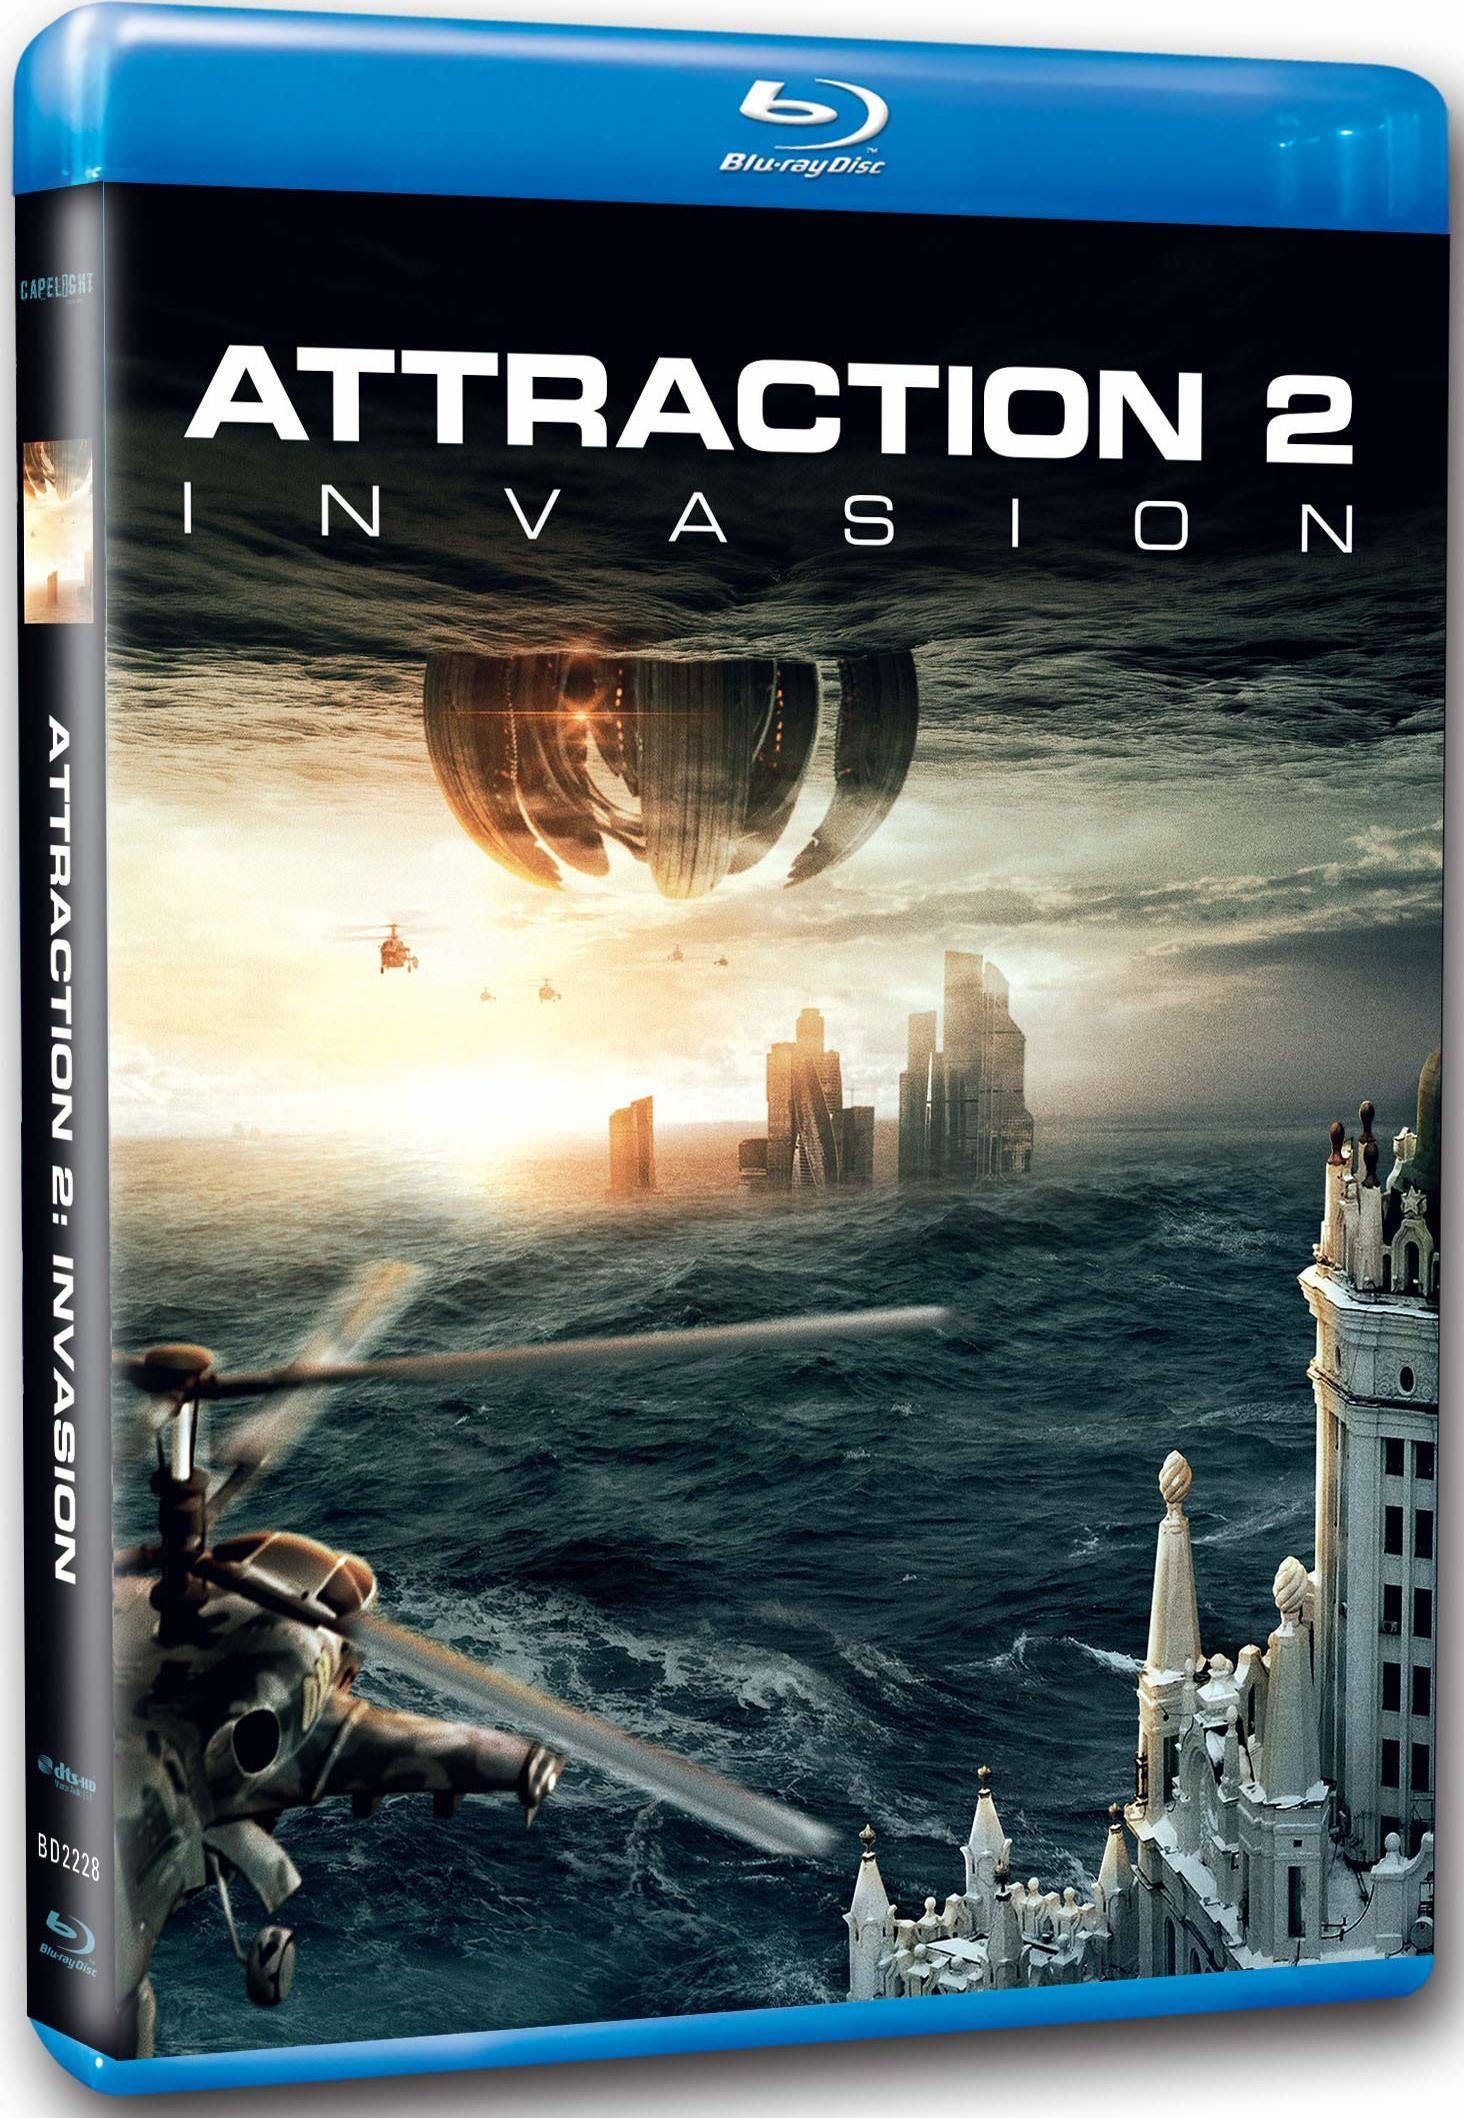 Attraction 2 Invasion Blu Ray Release Date July 21 2020 Vtorzhenie Alien Encounters Attraction Movie Guide